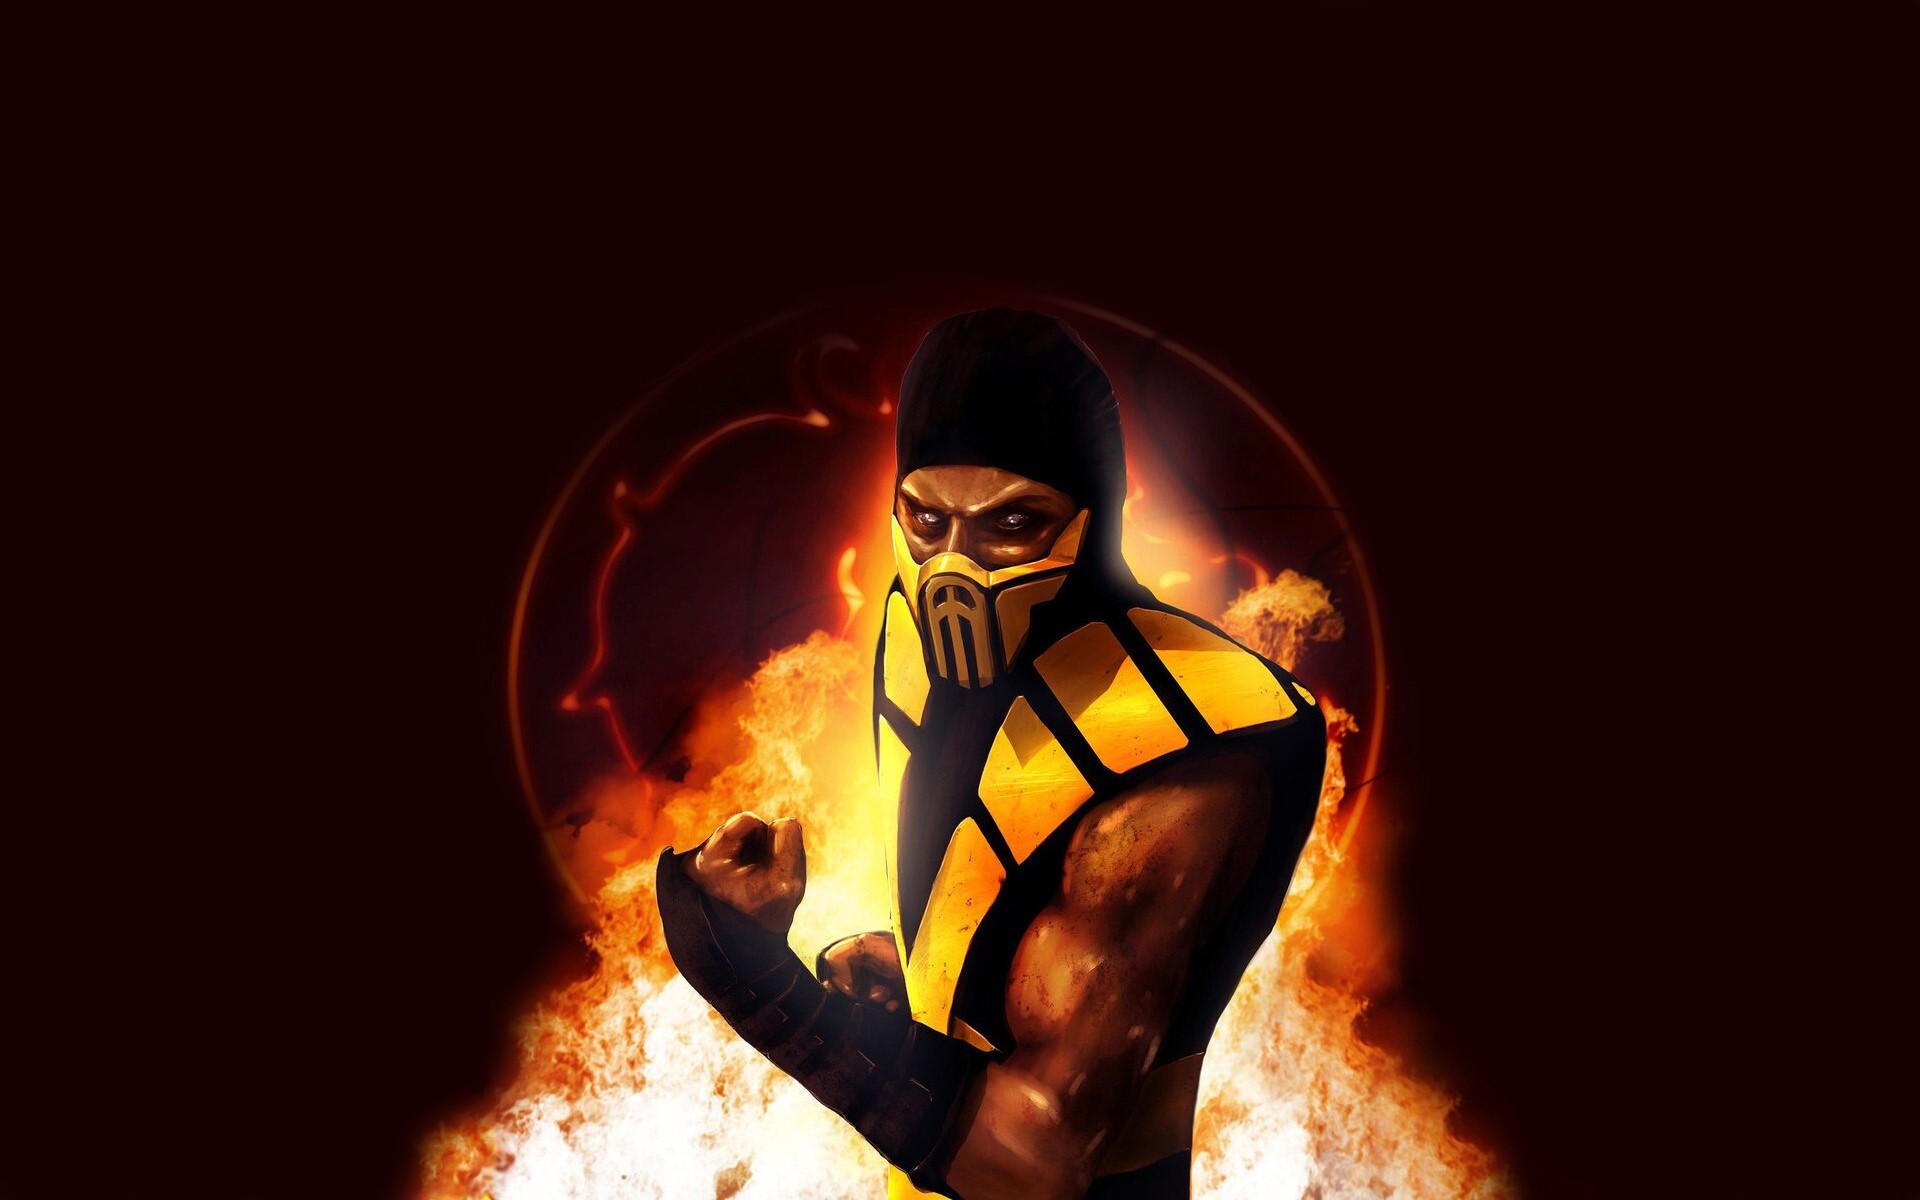 Scorpion Mortal Kombat Character Wallpapers Hd Wallpapers